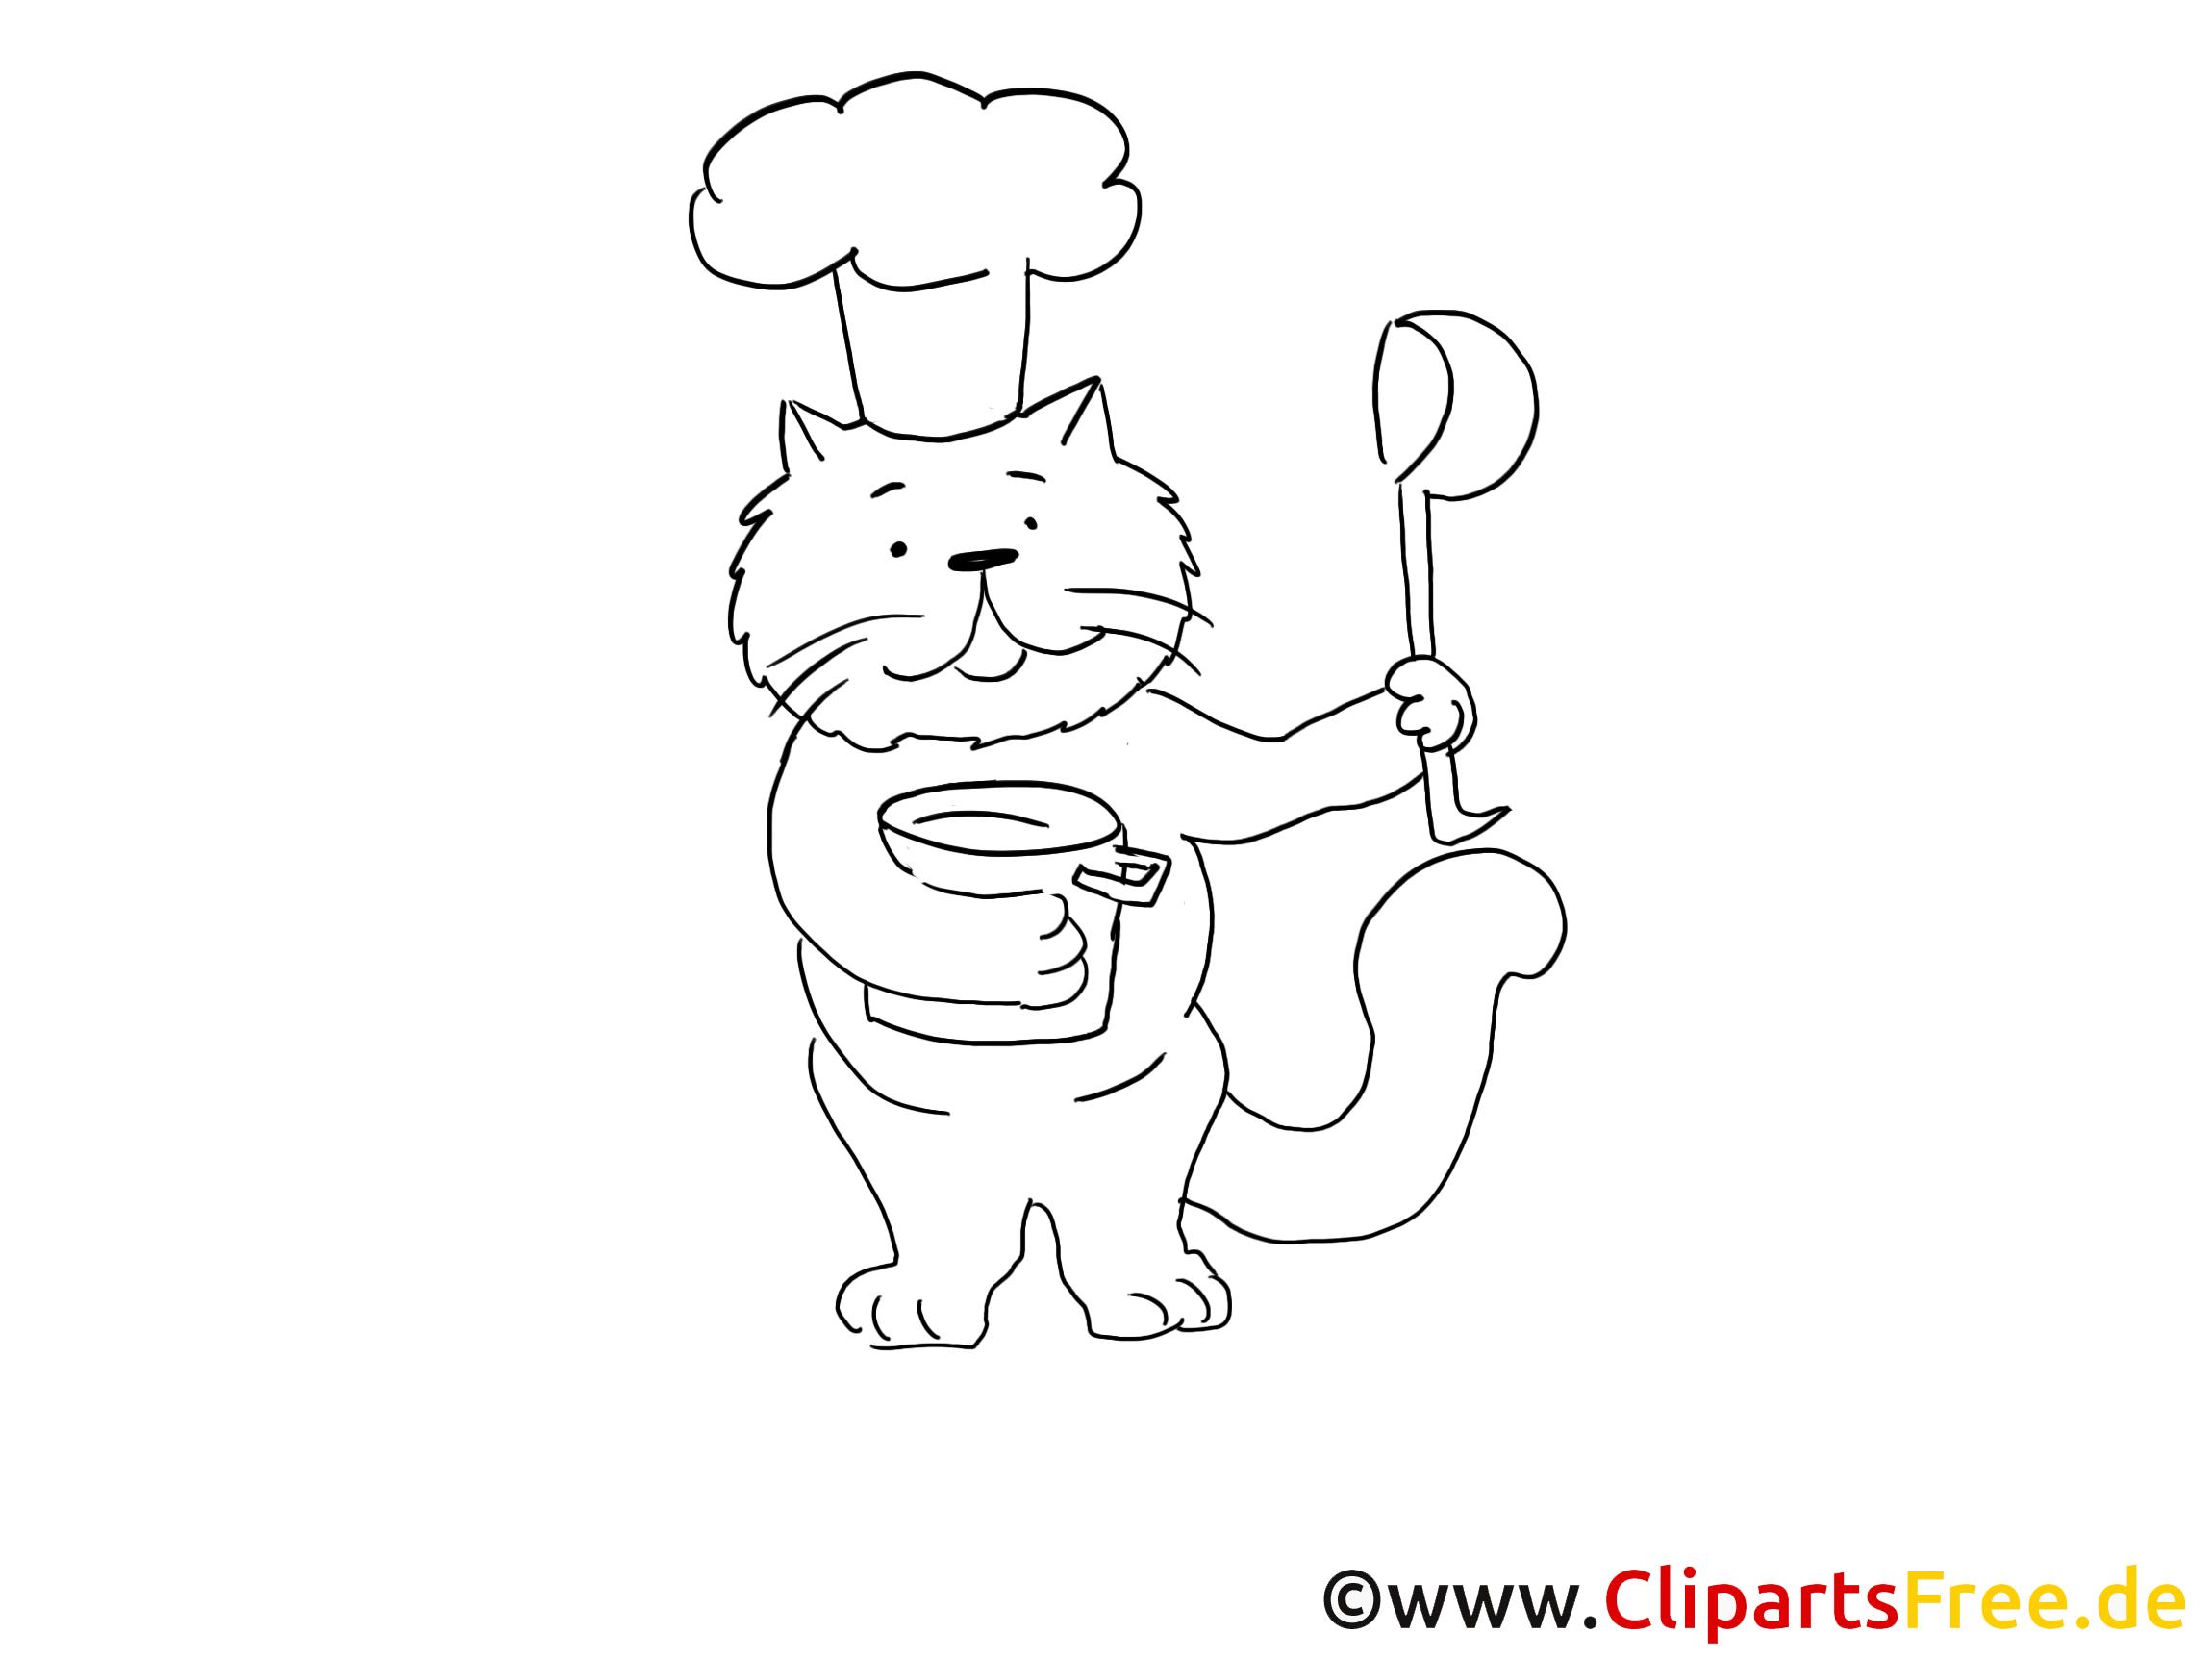 Cuisinier dessin – Chats gratuits à imprimer